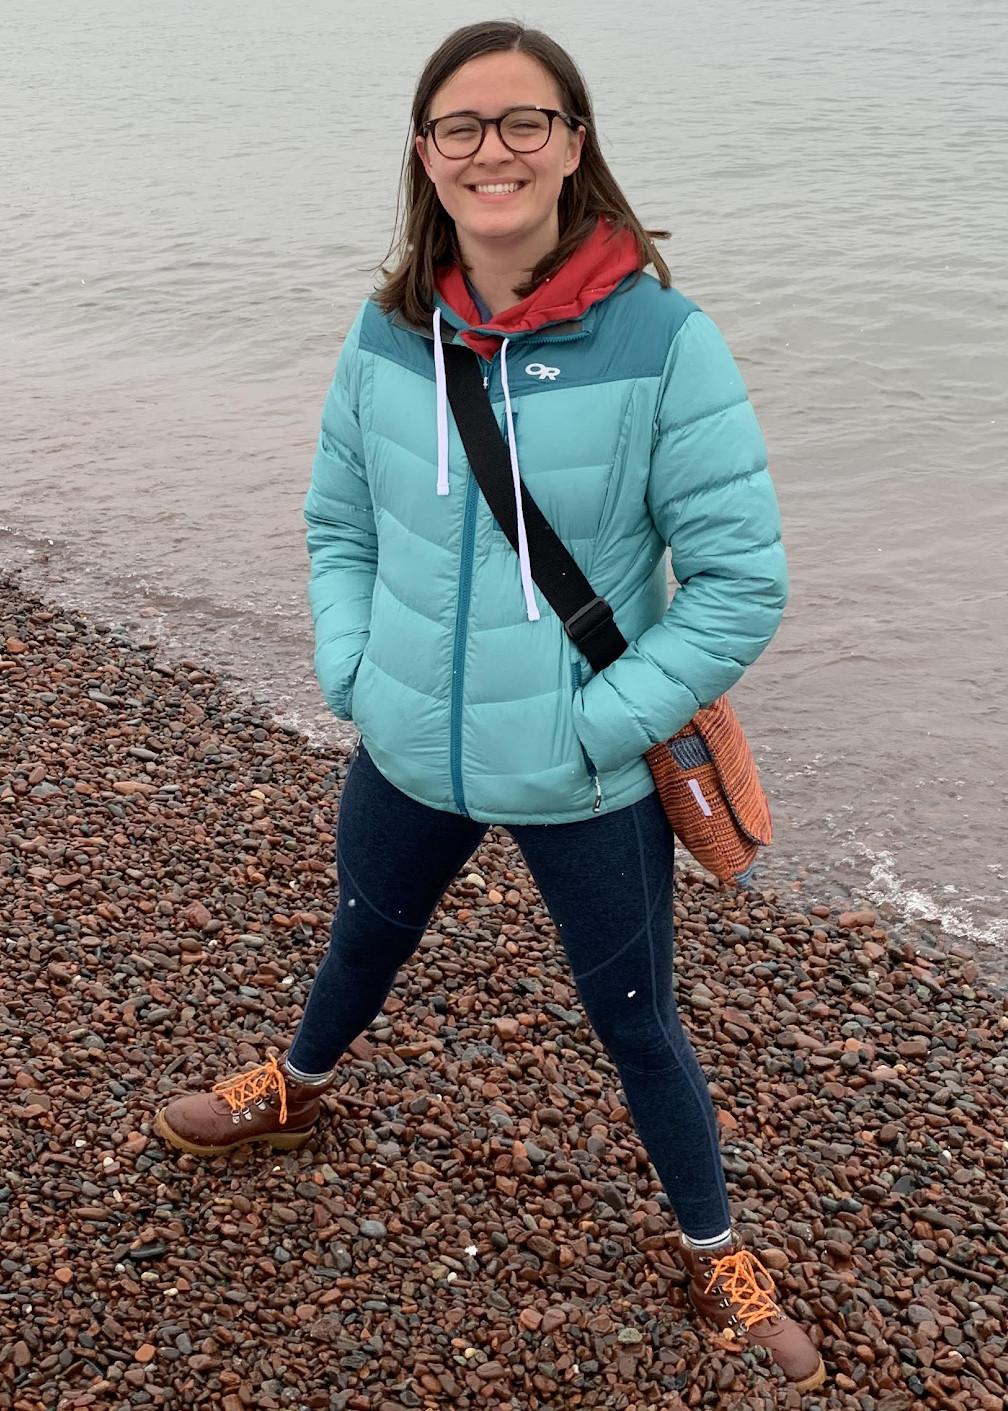 Maddie posing on a rock beach